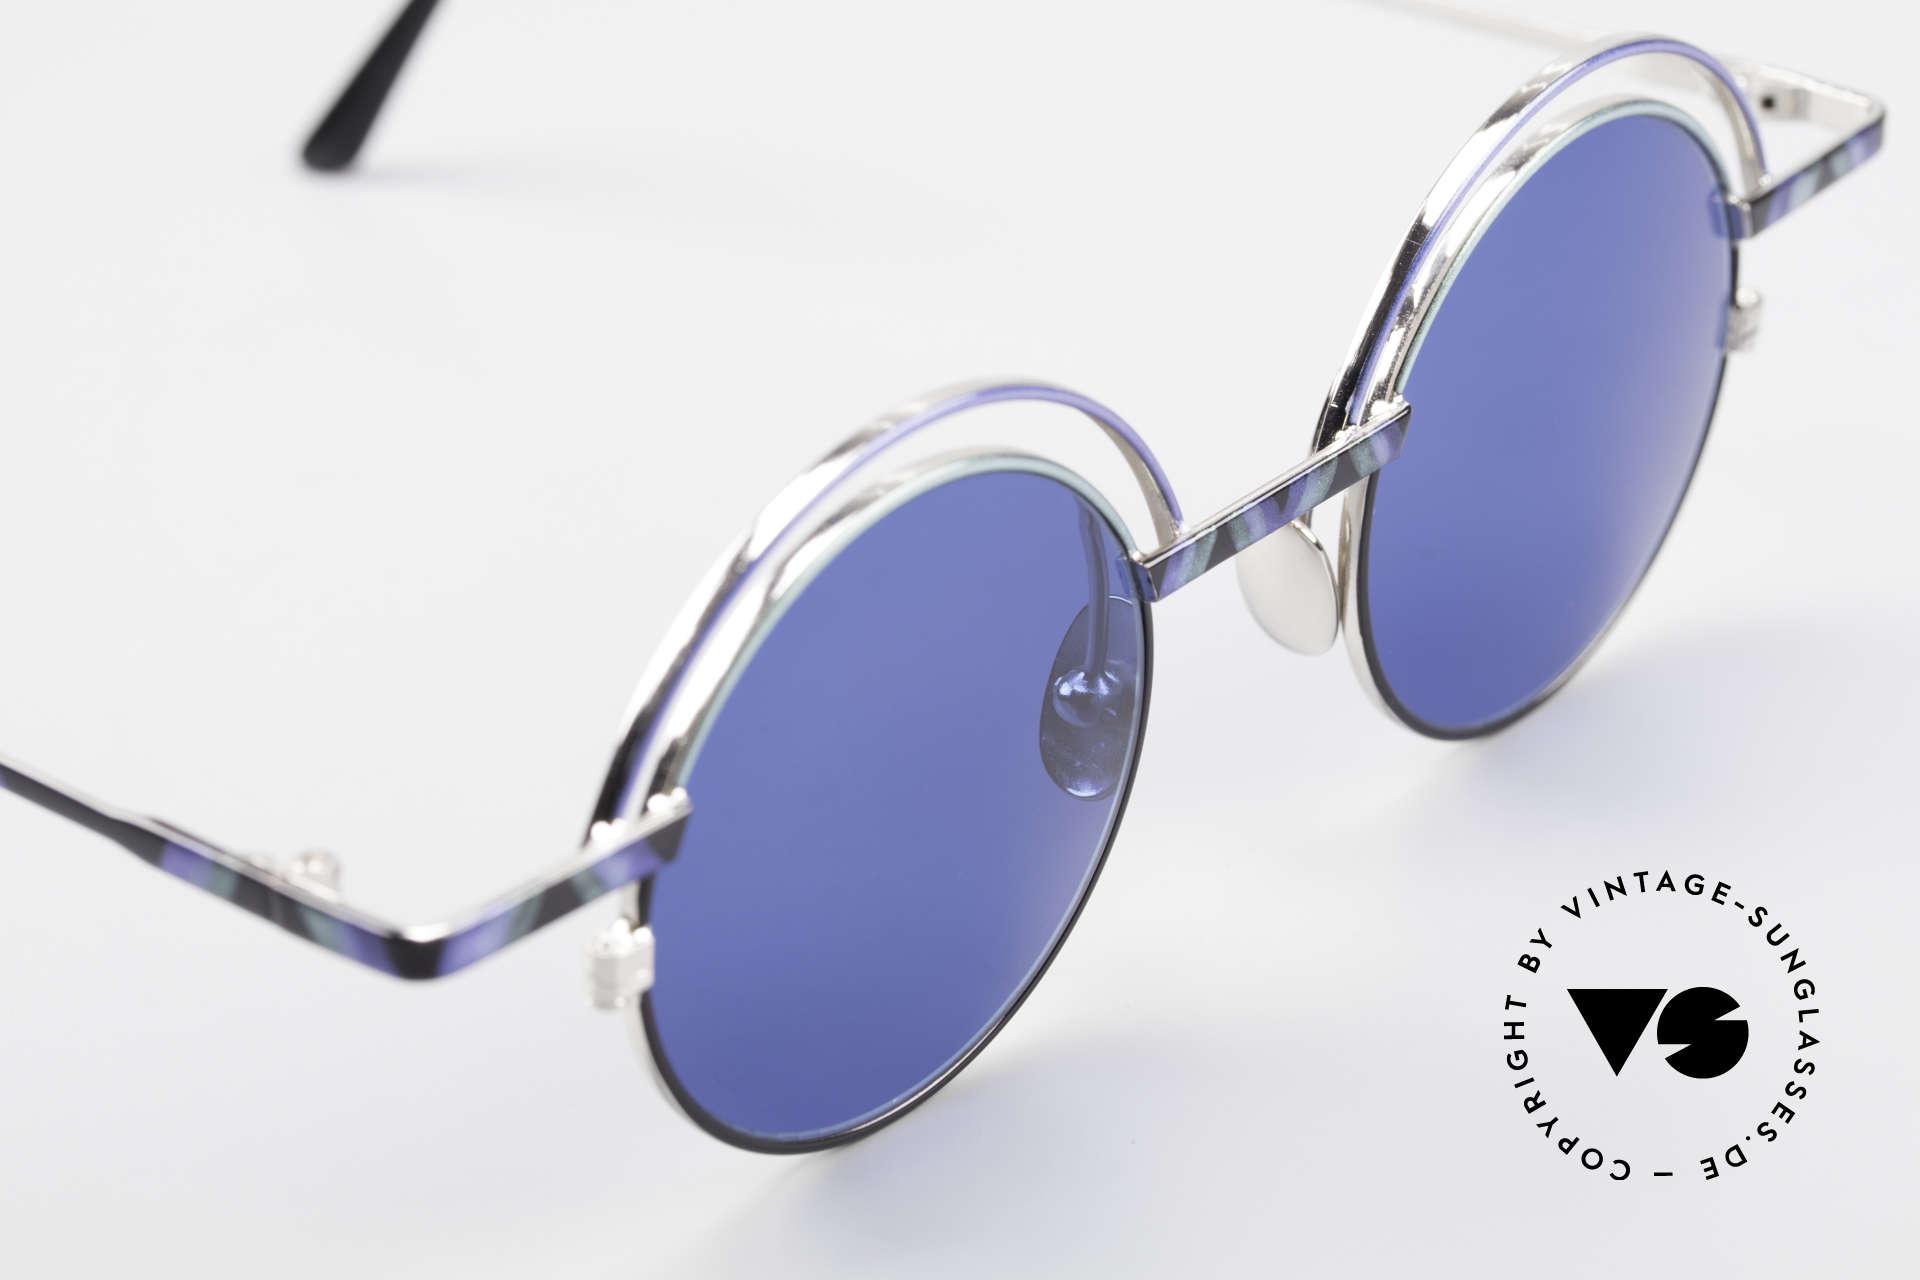 IMAGO Pluto Art Designer Sunglasses 90's, NO RETRO (reproduction) shades, but a real old original!, Made for Men and Women